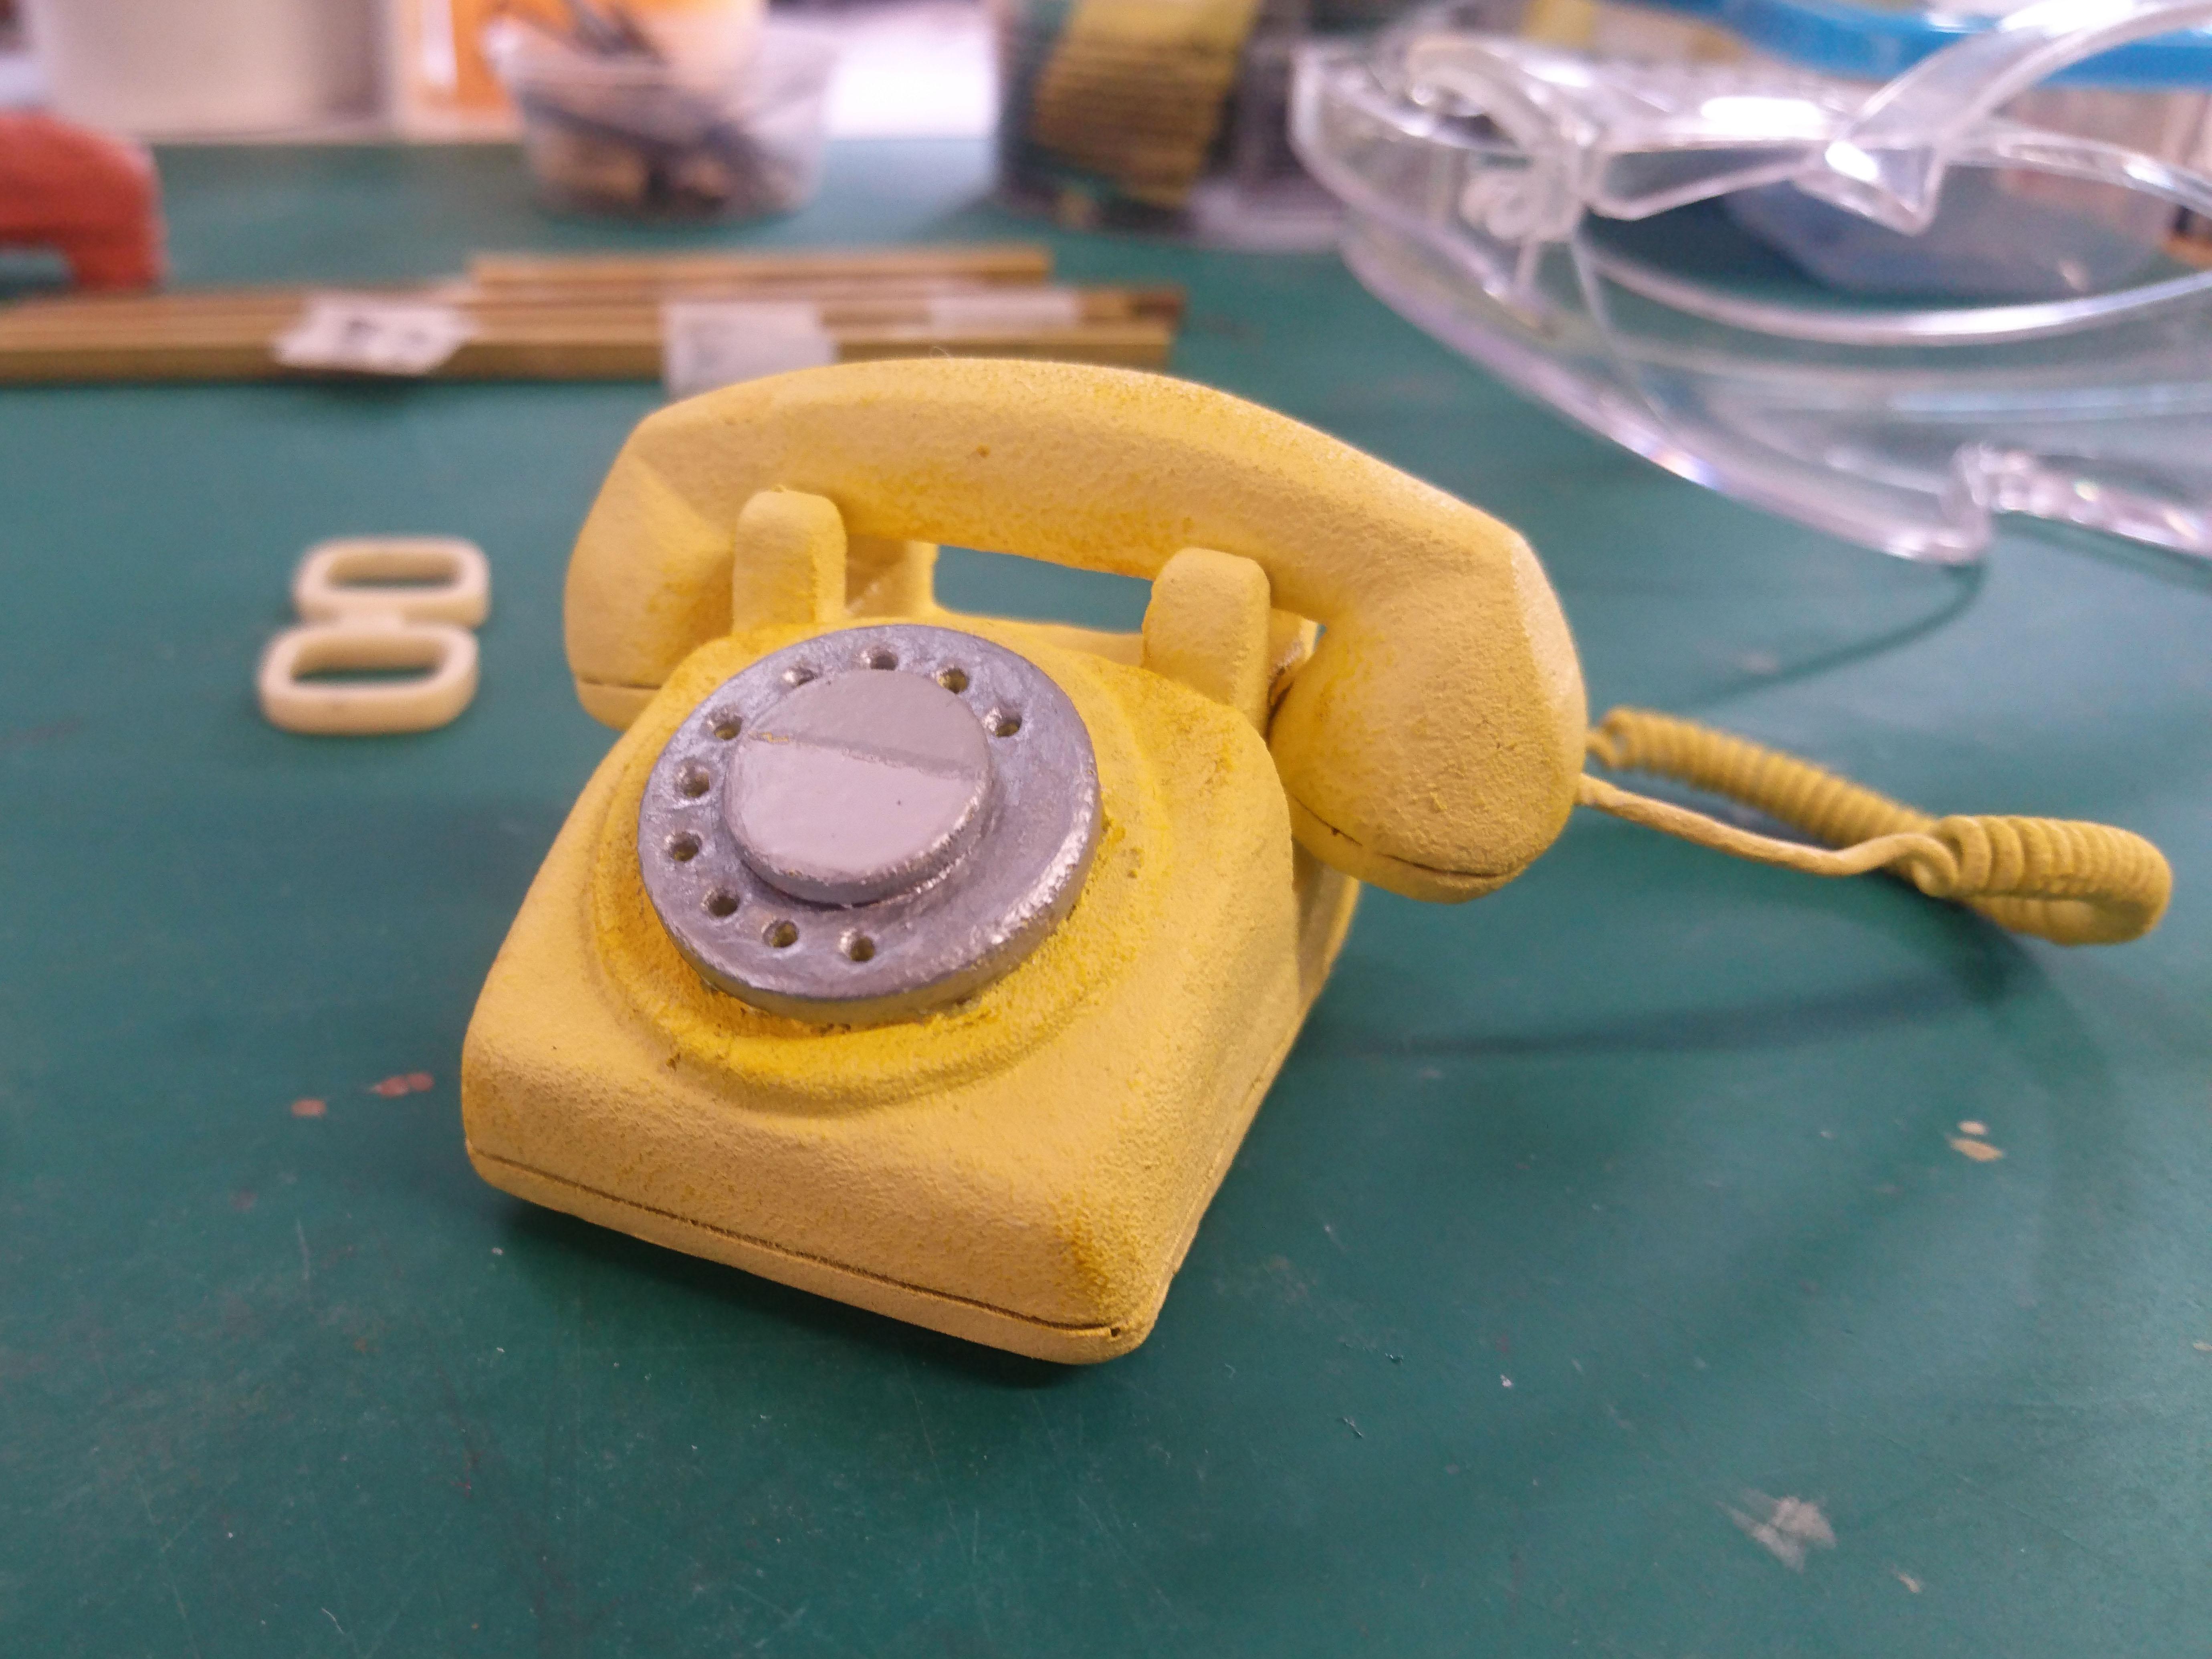 Phone CITV2